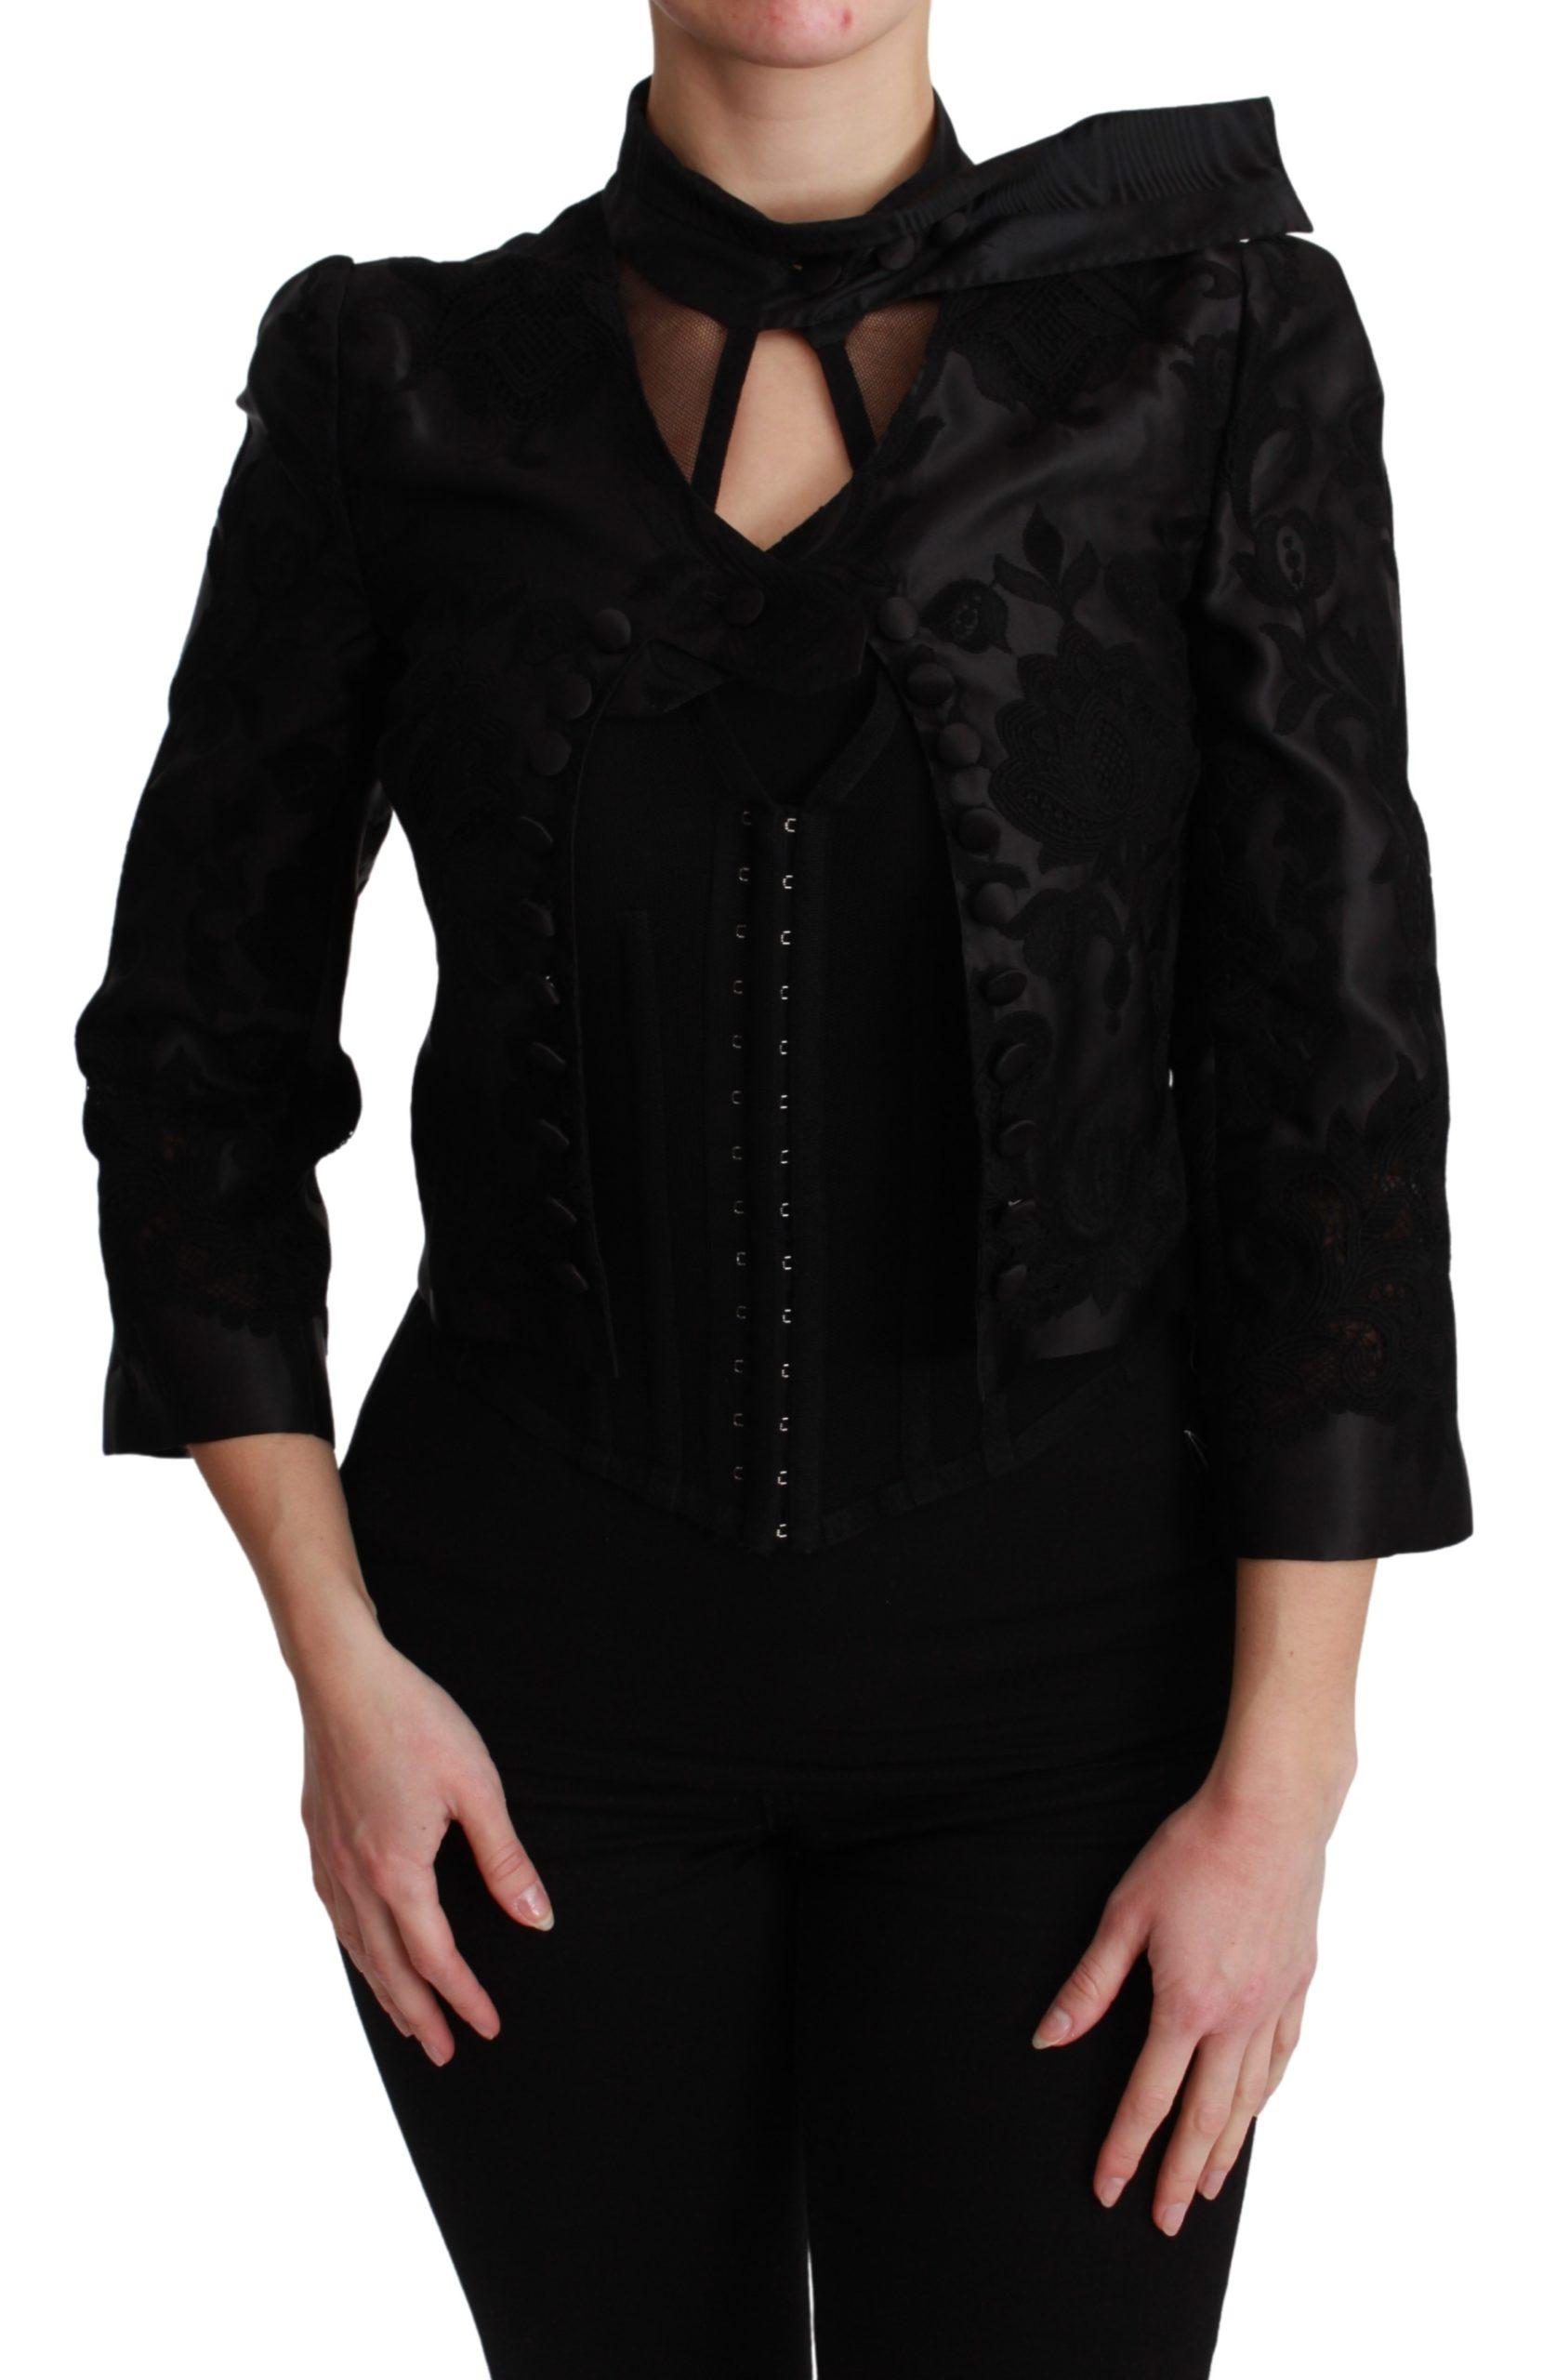 Black Floral Jacquard Blazer Silk Jacket - IT38|XS